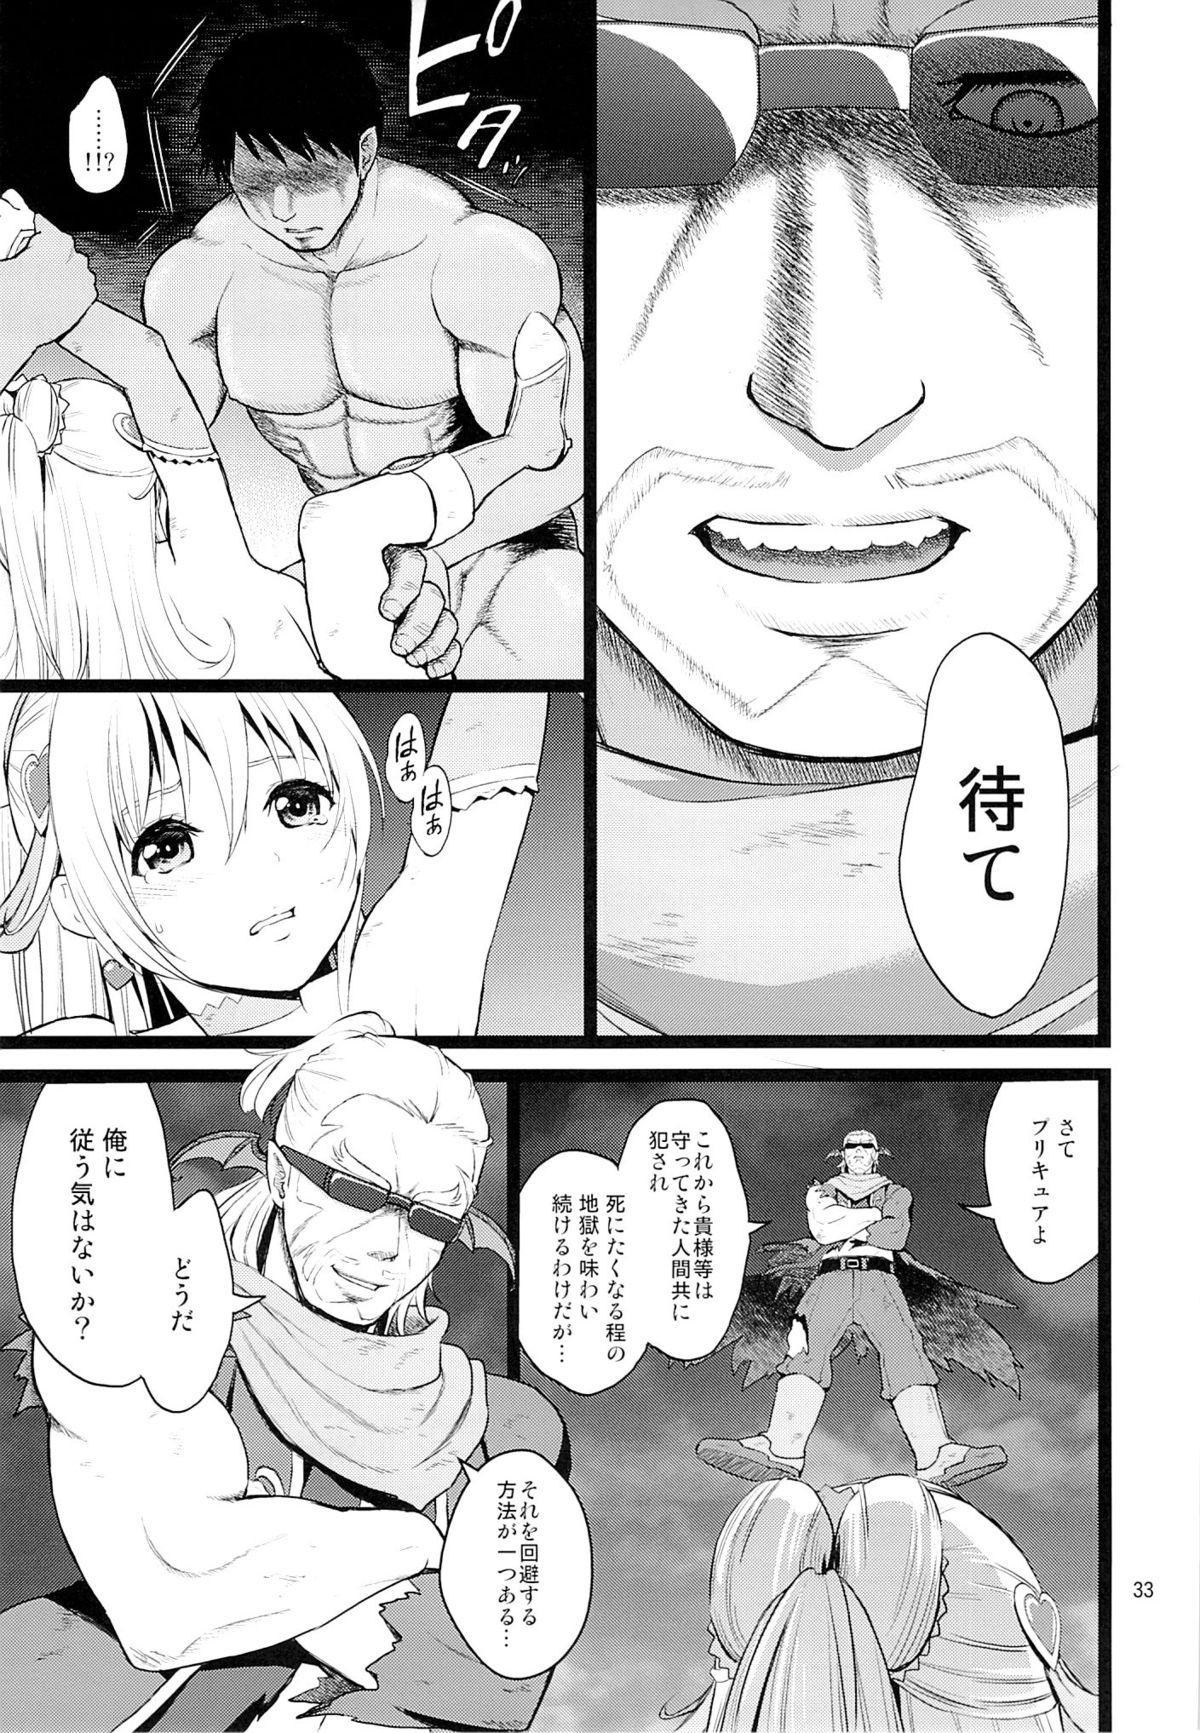 Kanzen Haiboku 31